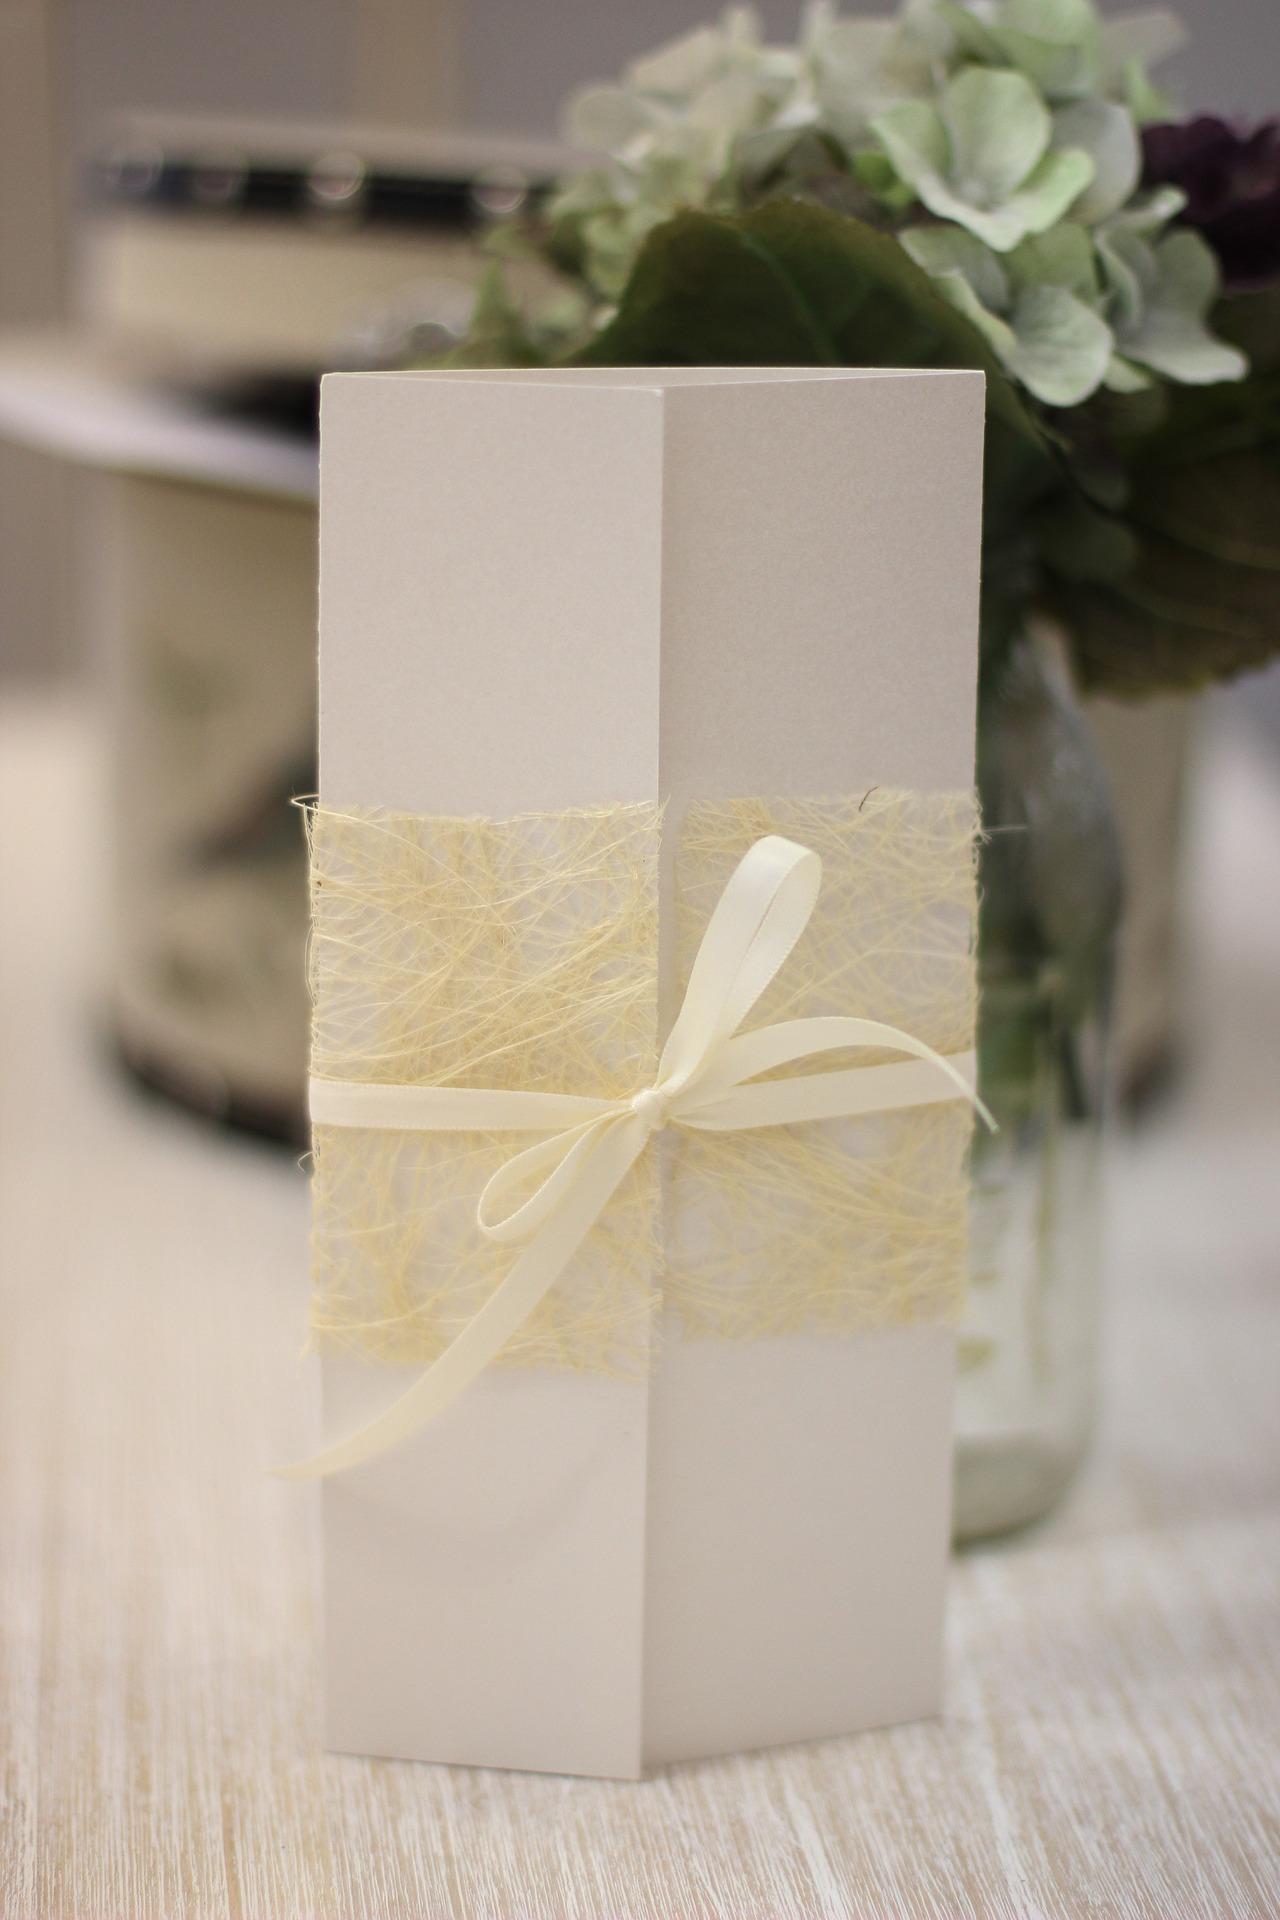 Surrey Weddings - Love from lila xx